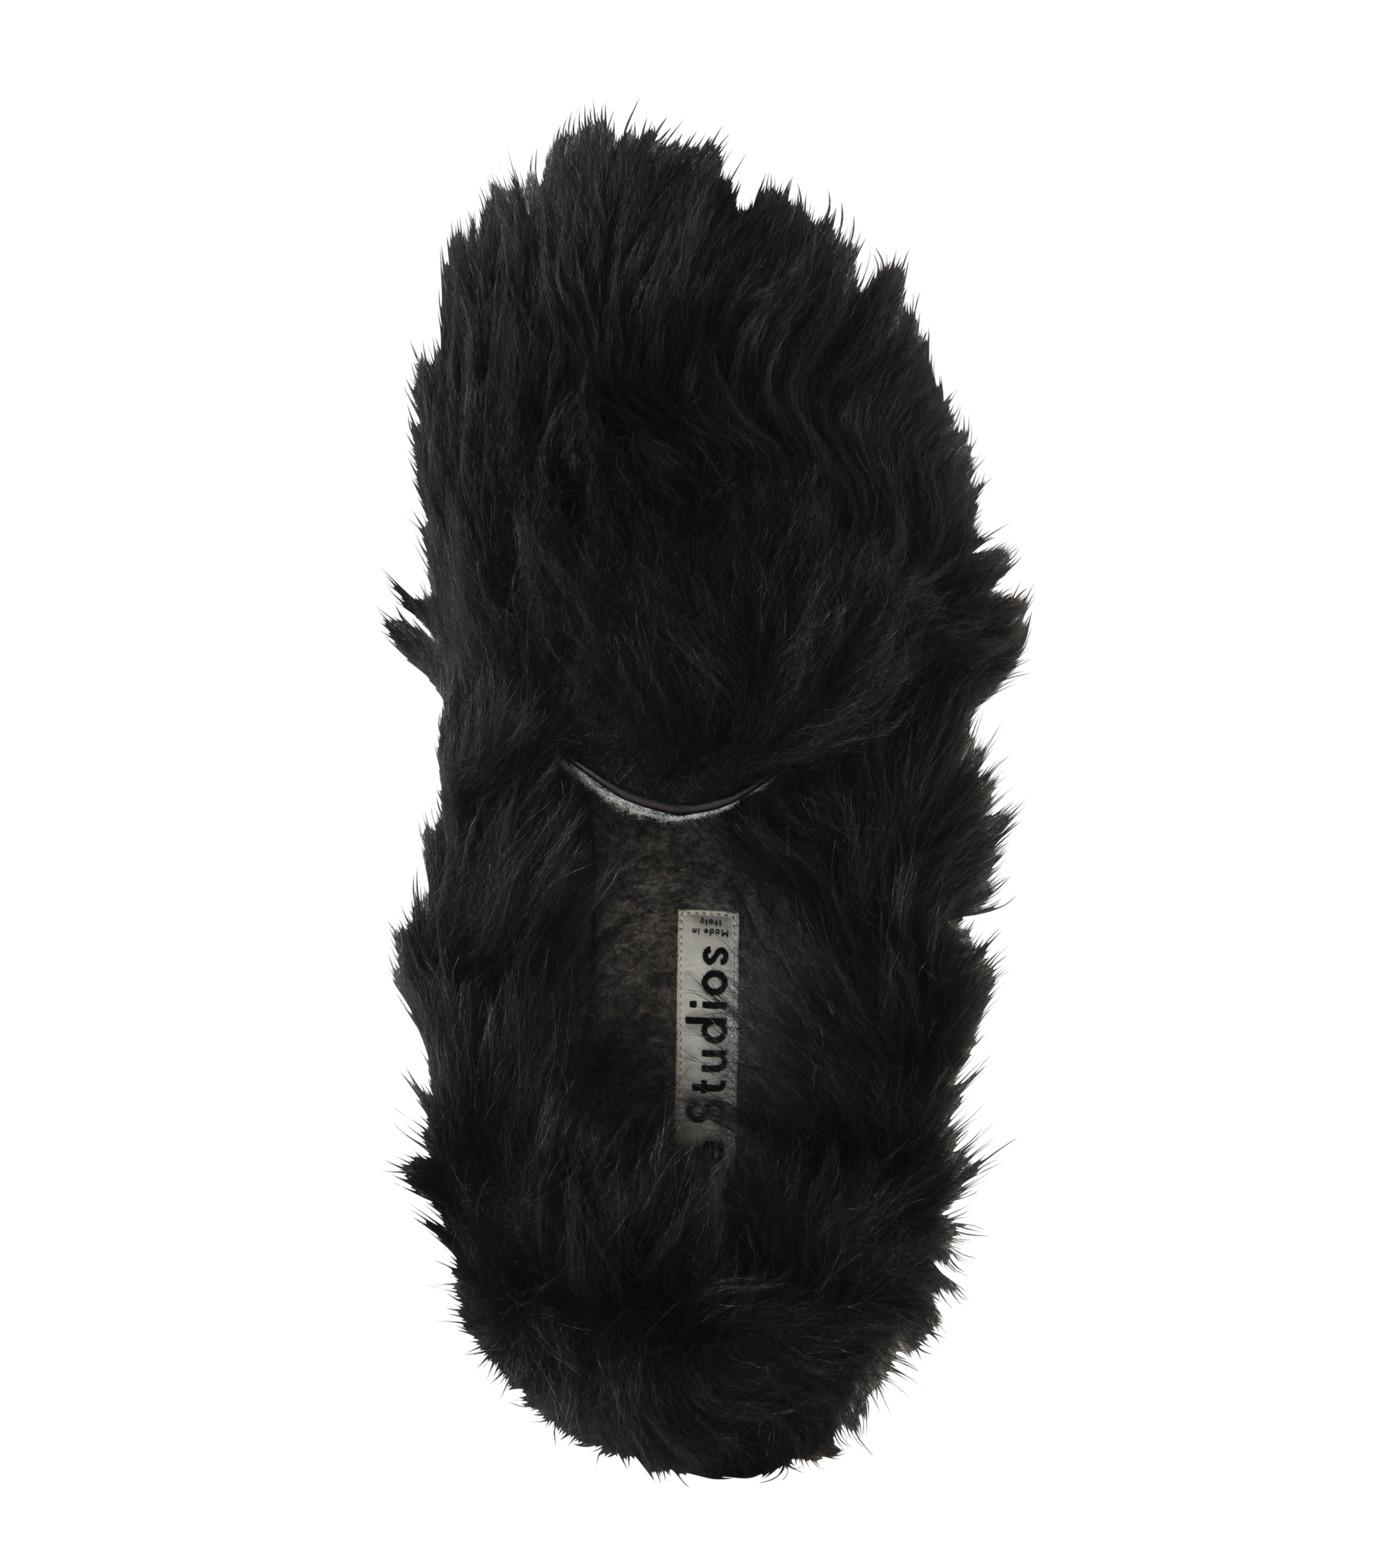 ACNE STUDIOS(アクネ ストゥディオズ)のBalto Fur Slipon-BLACK(シューズ/shoes)-2E0144-13 拡大詳細画像5